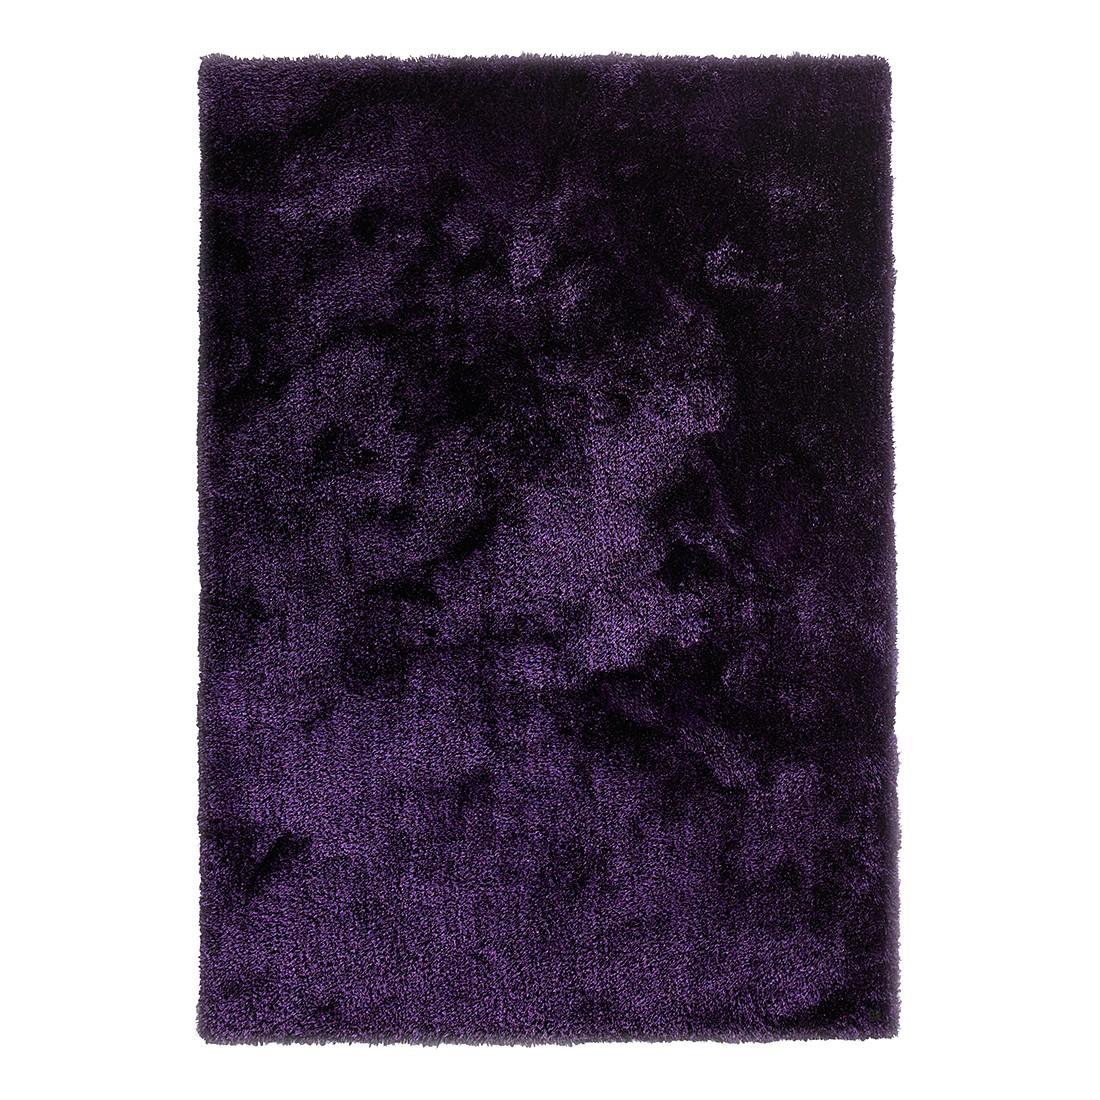 Teppich Soft Square - Violett - Maße: 85 x 155 cm, Tom Tailor